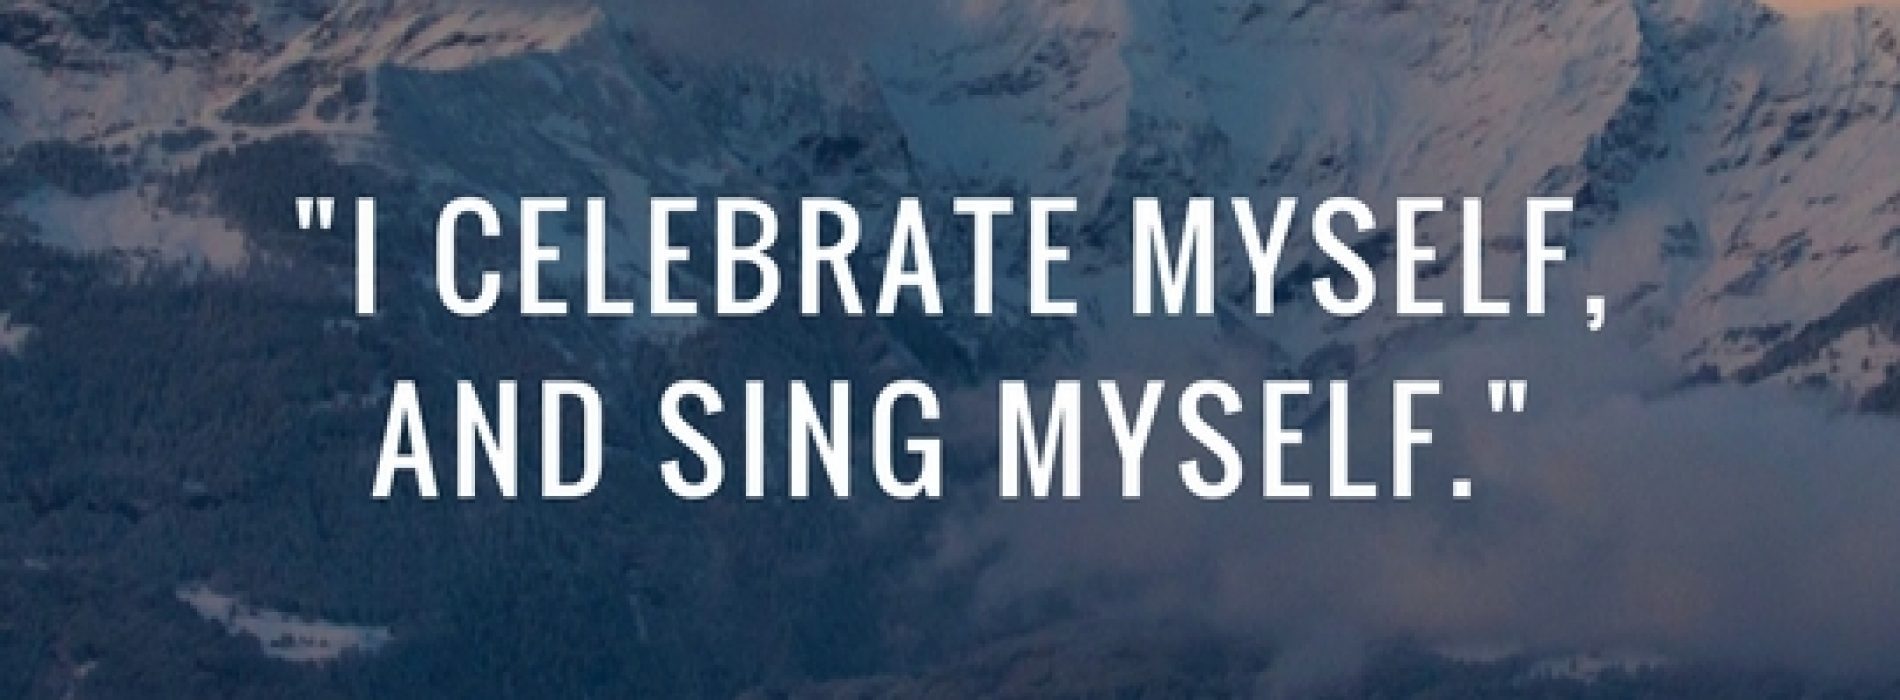 i celebrate myself and sing myself